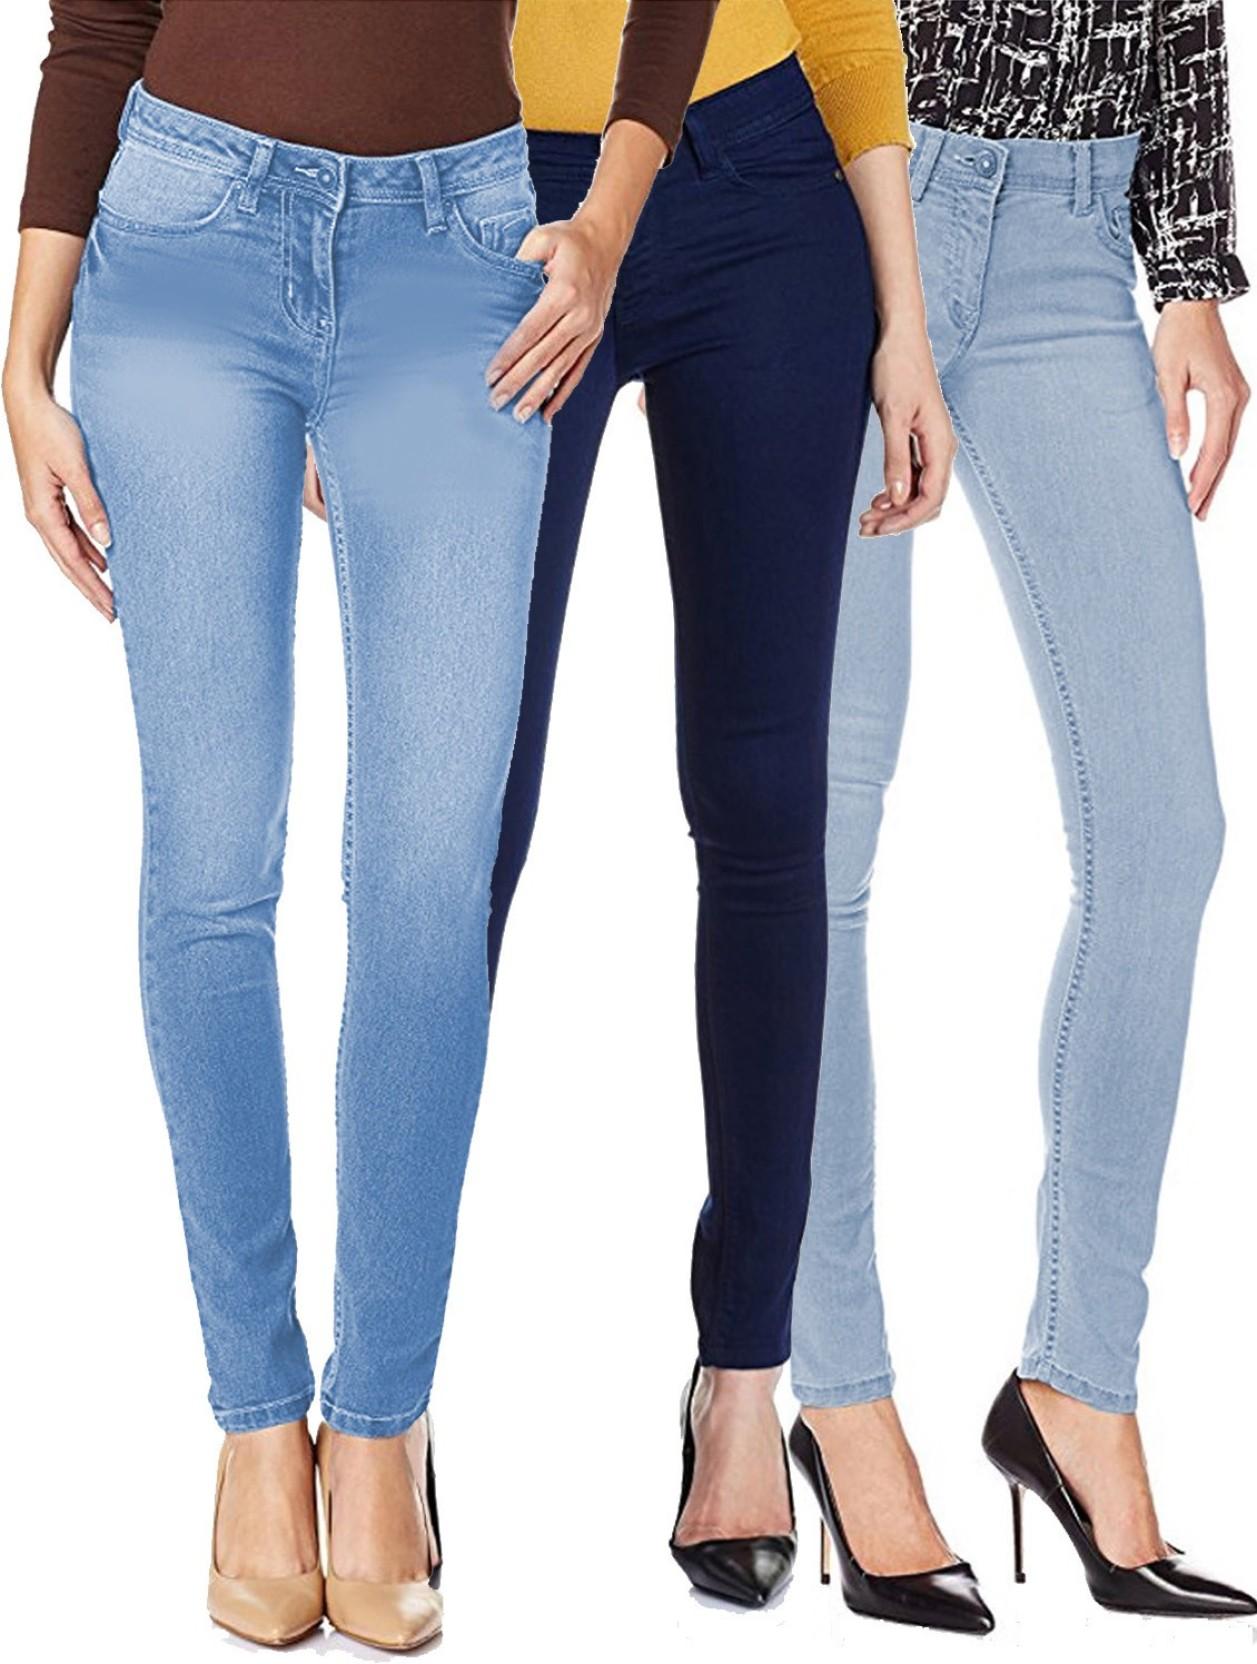 Fuego Regular Women Light Blue, Blue Jeans - Buy Fuego